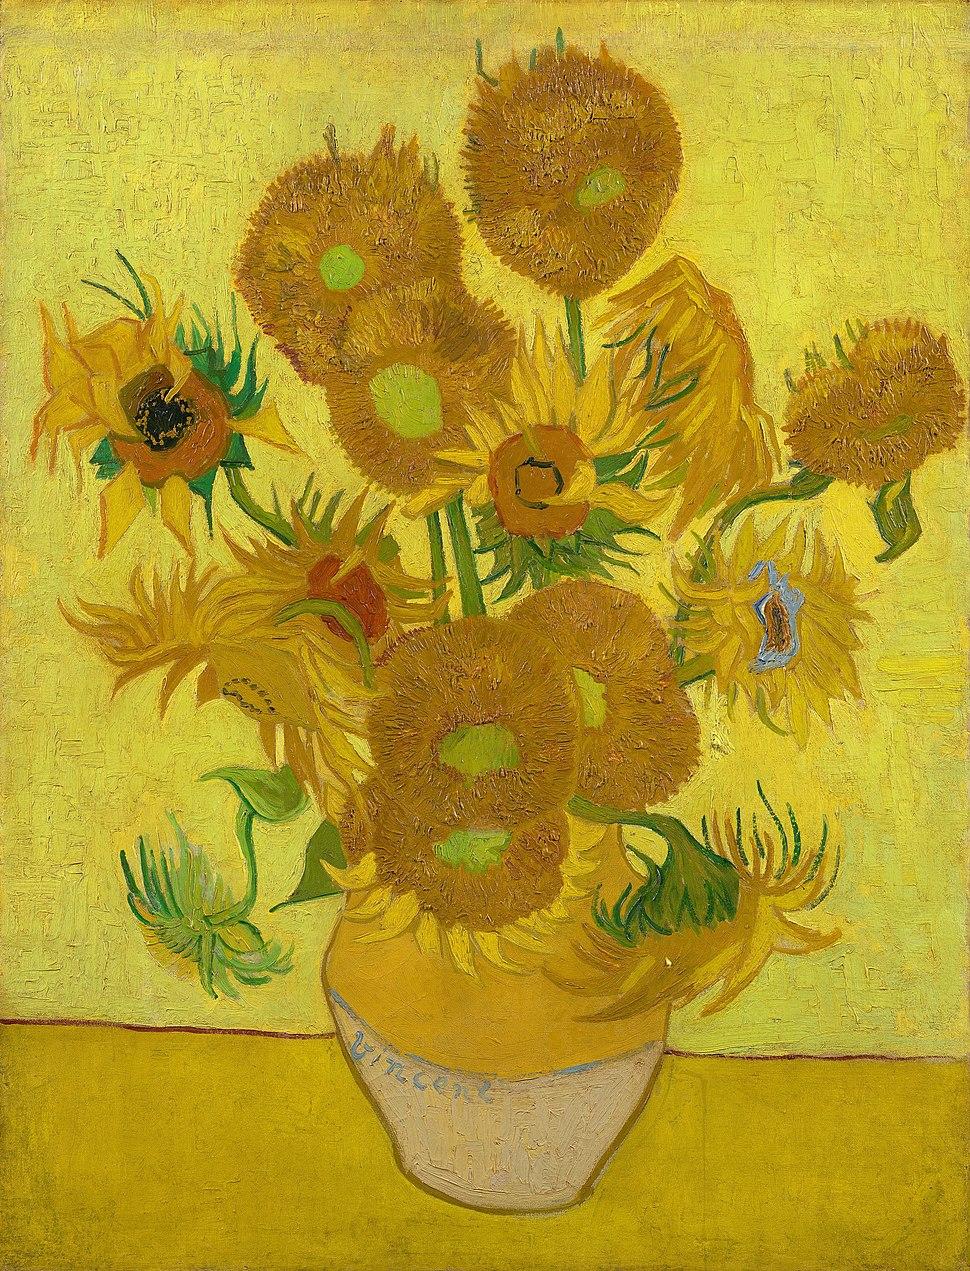 Vincent van Gogh - Sunflowers - VGM F458